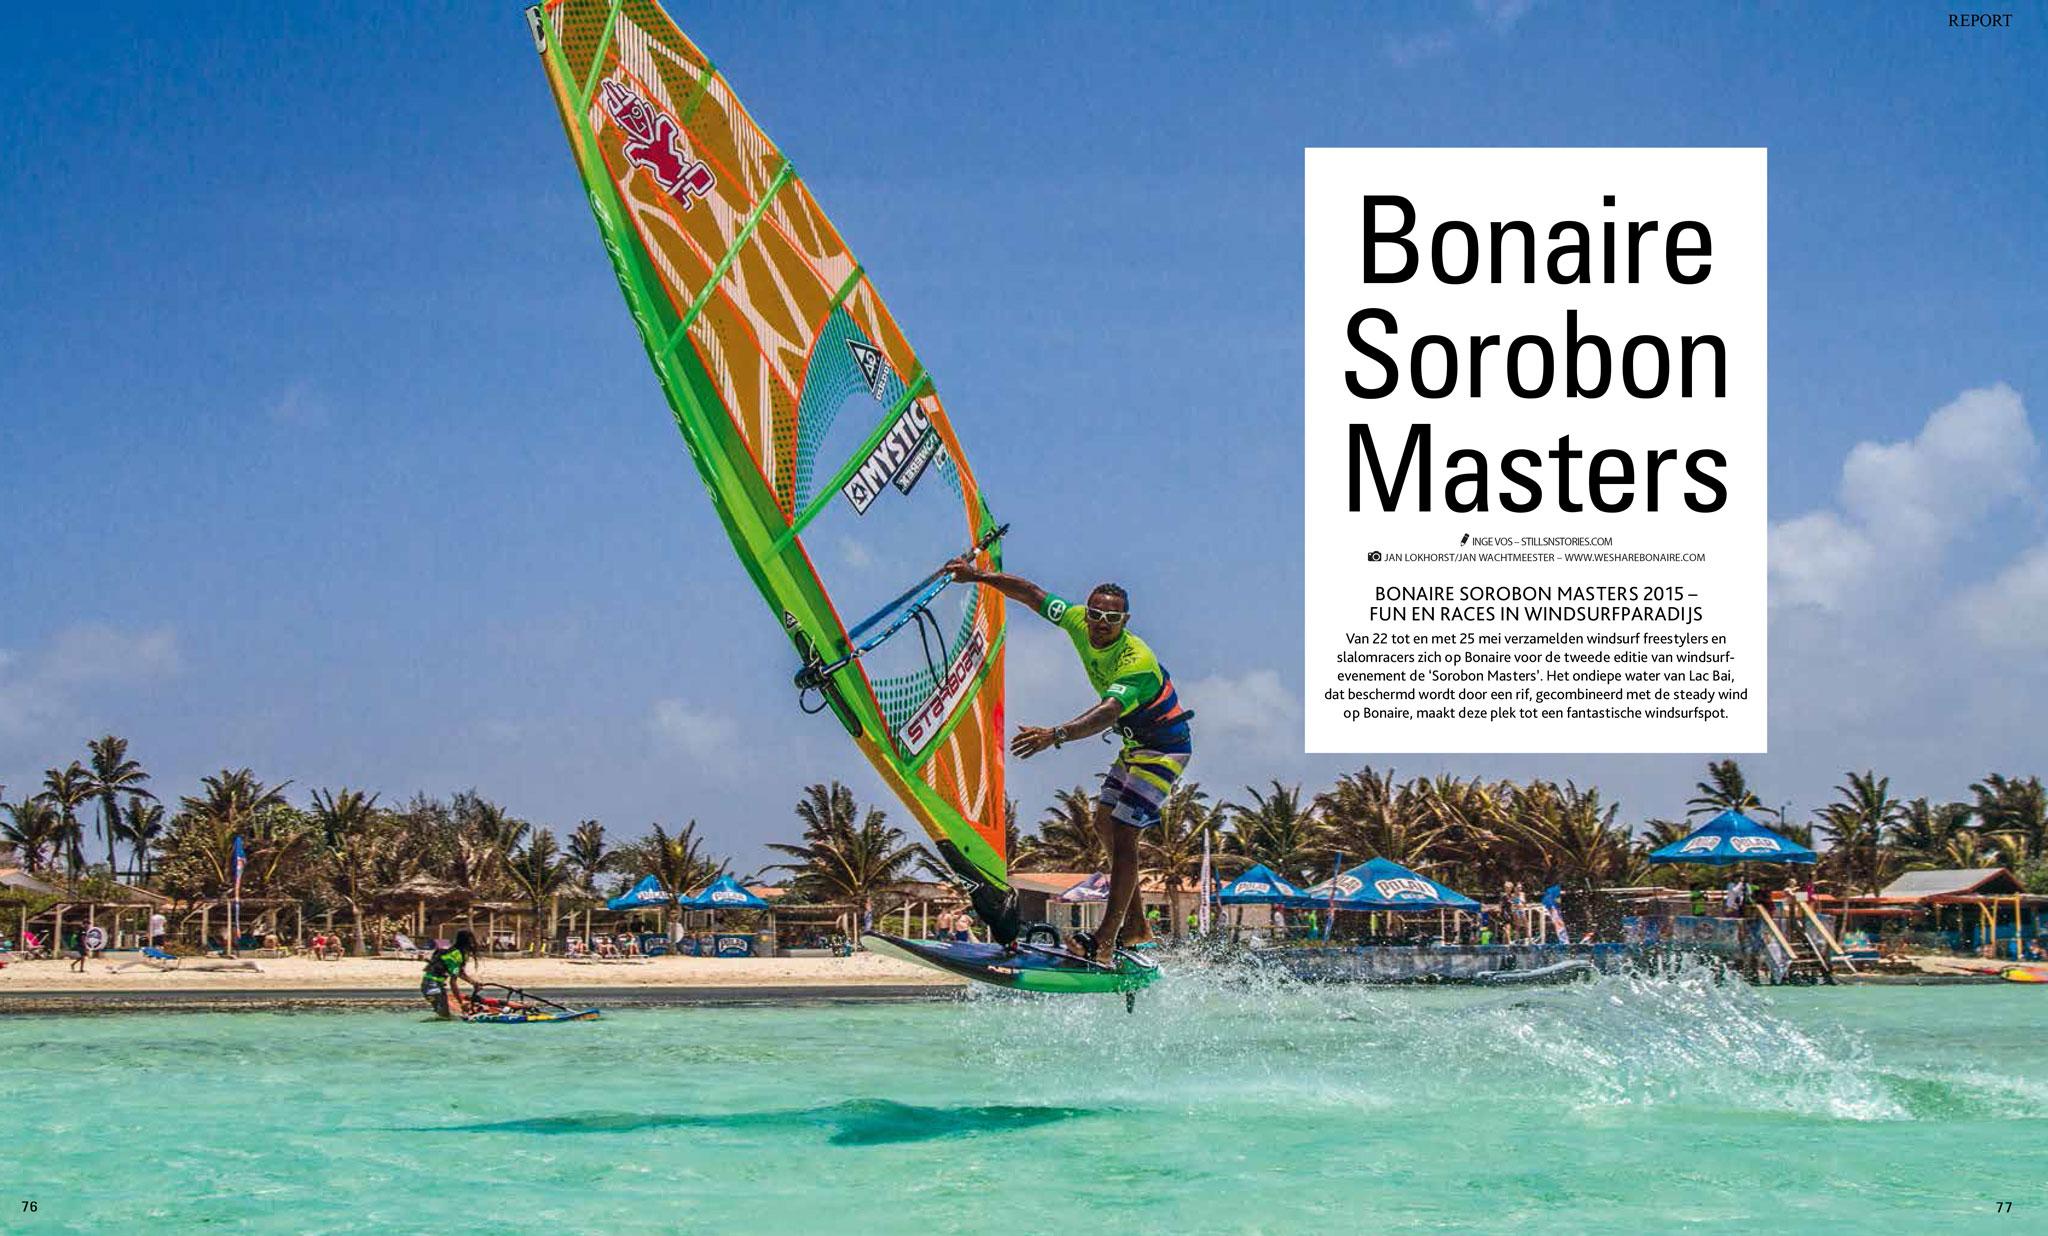 216adba8e347 The windsurf masters were on Bonaire